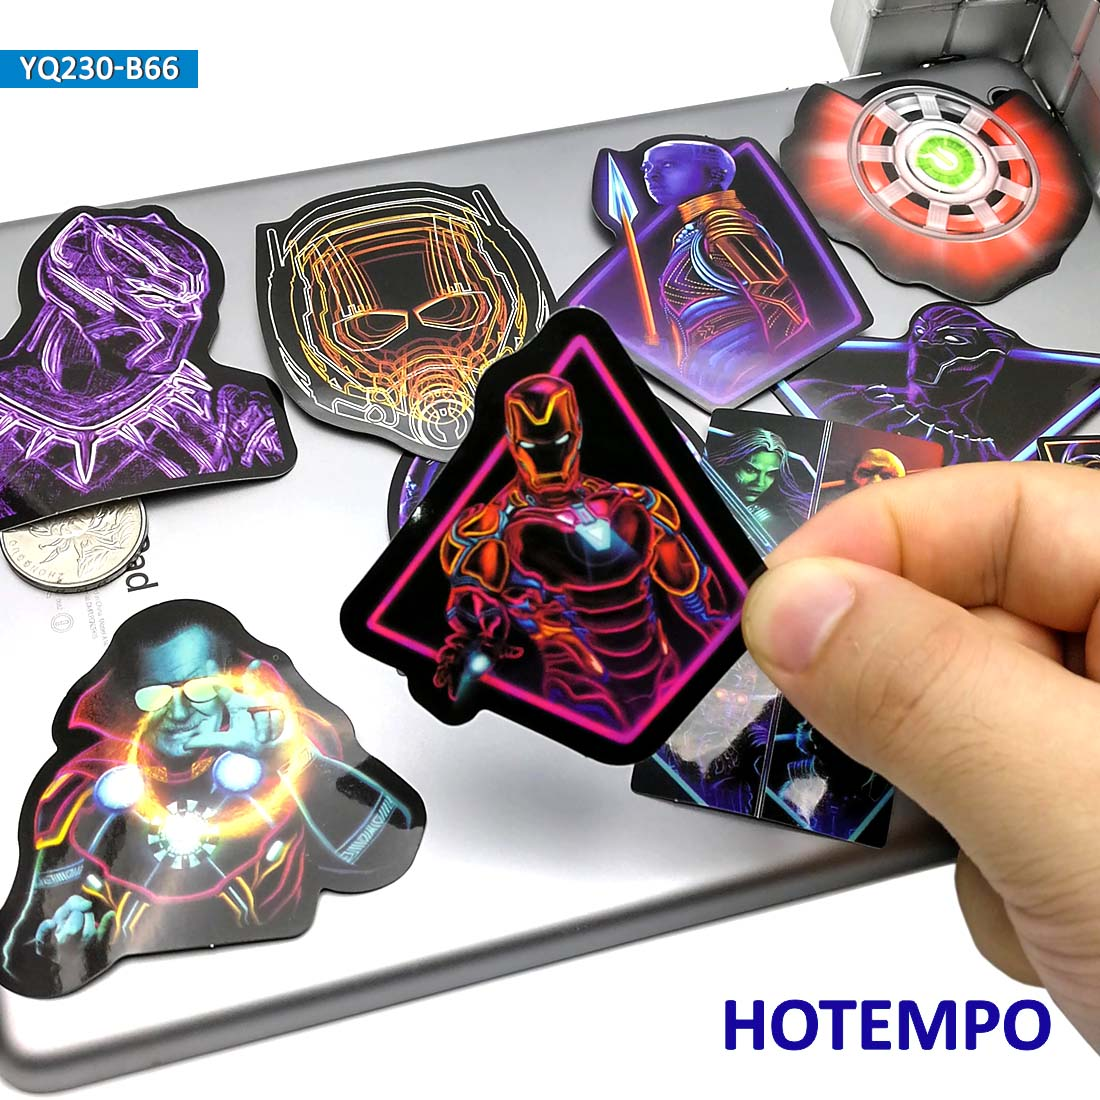 66pcs Neon Super Hero Avengers Led Light Style Fashion Stickers For Mobile Phone Laptop Luggage Case Skateboard Bike Art Sticker